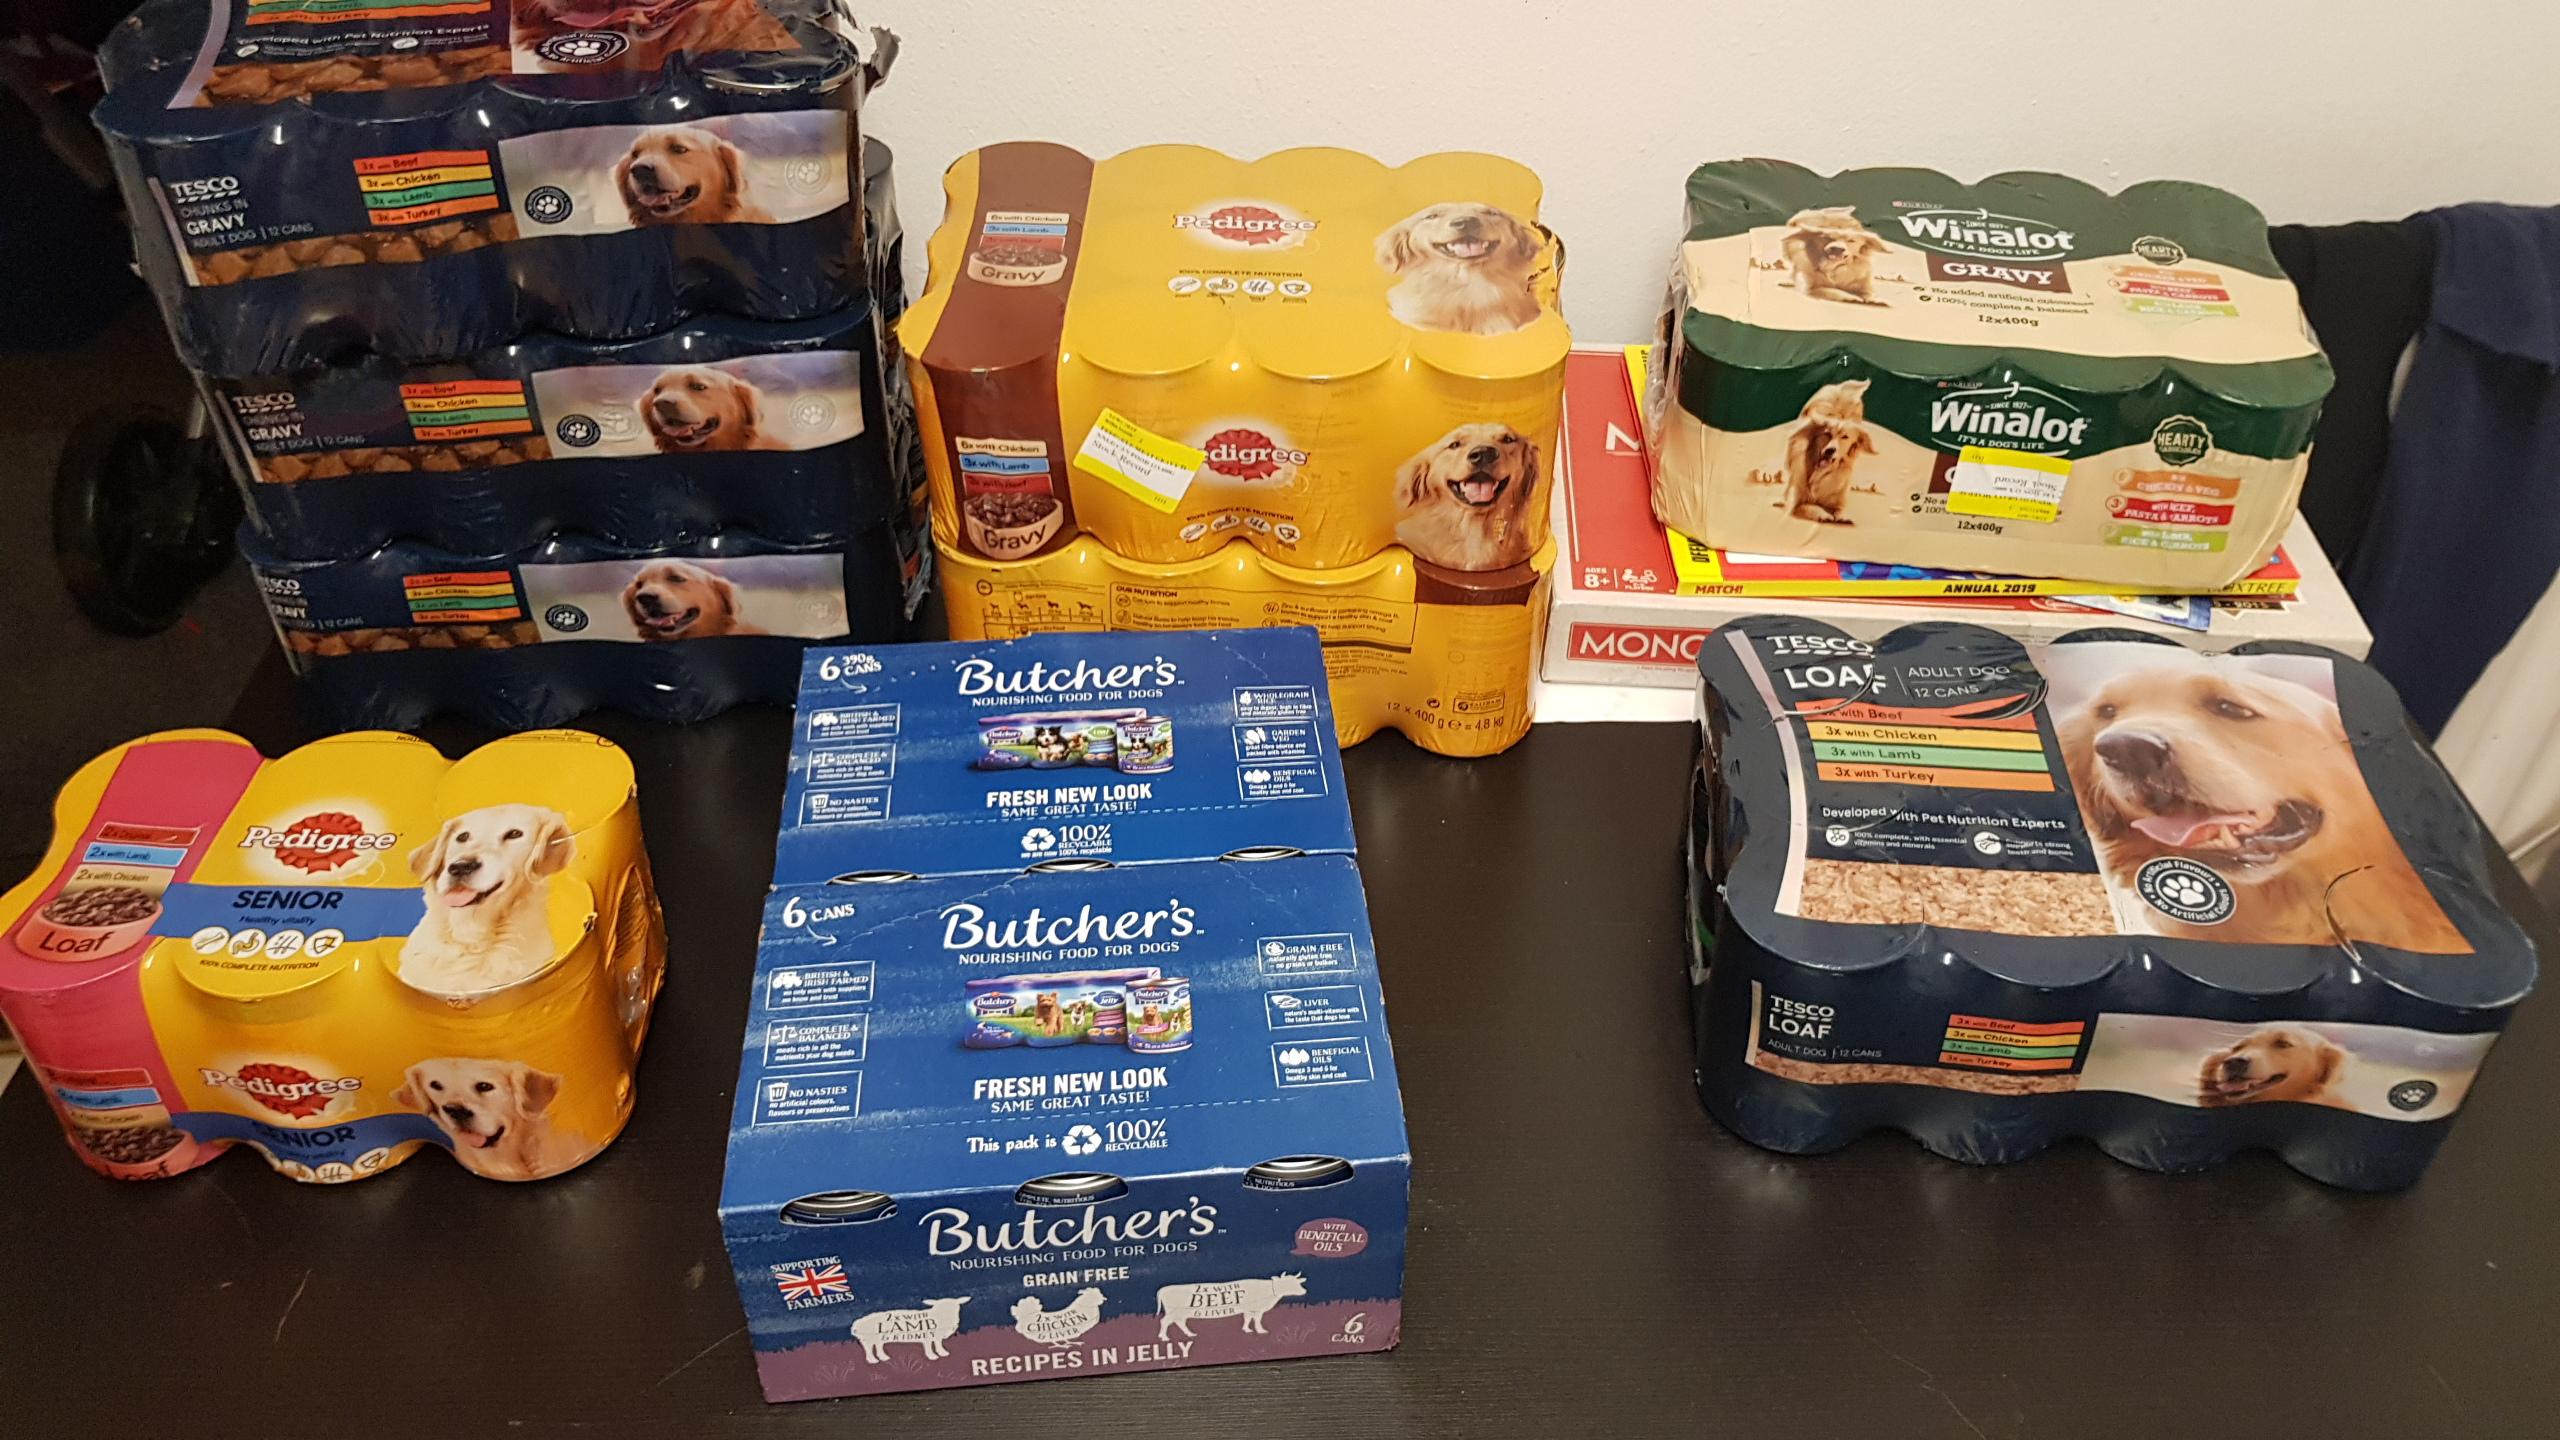 Tesco Dog Food Reductions 12XTesco £1.25, Pedigree 12x cans £1.64, Butchers 6 cans 99p, 12 Winalot £1.50. Milton Keynes